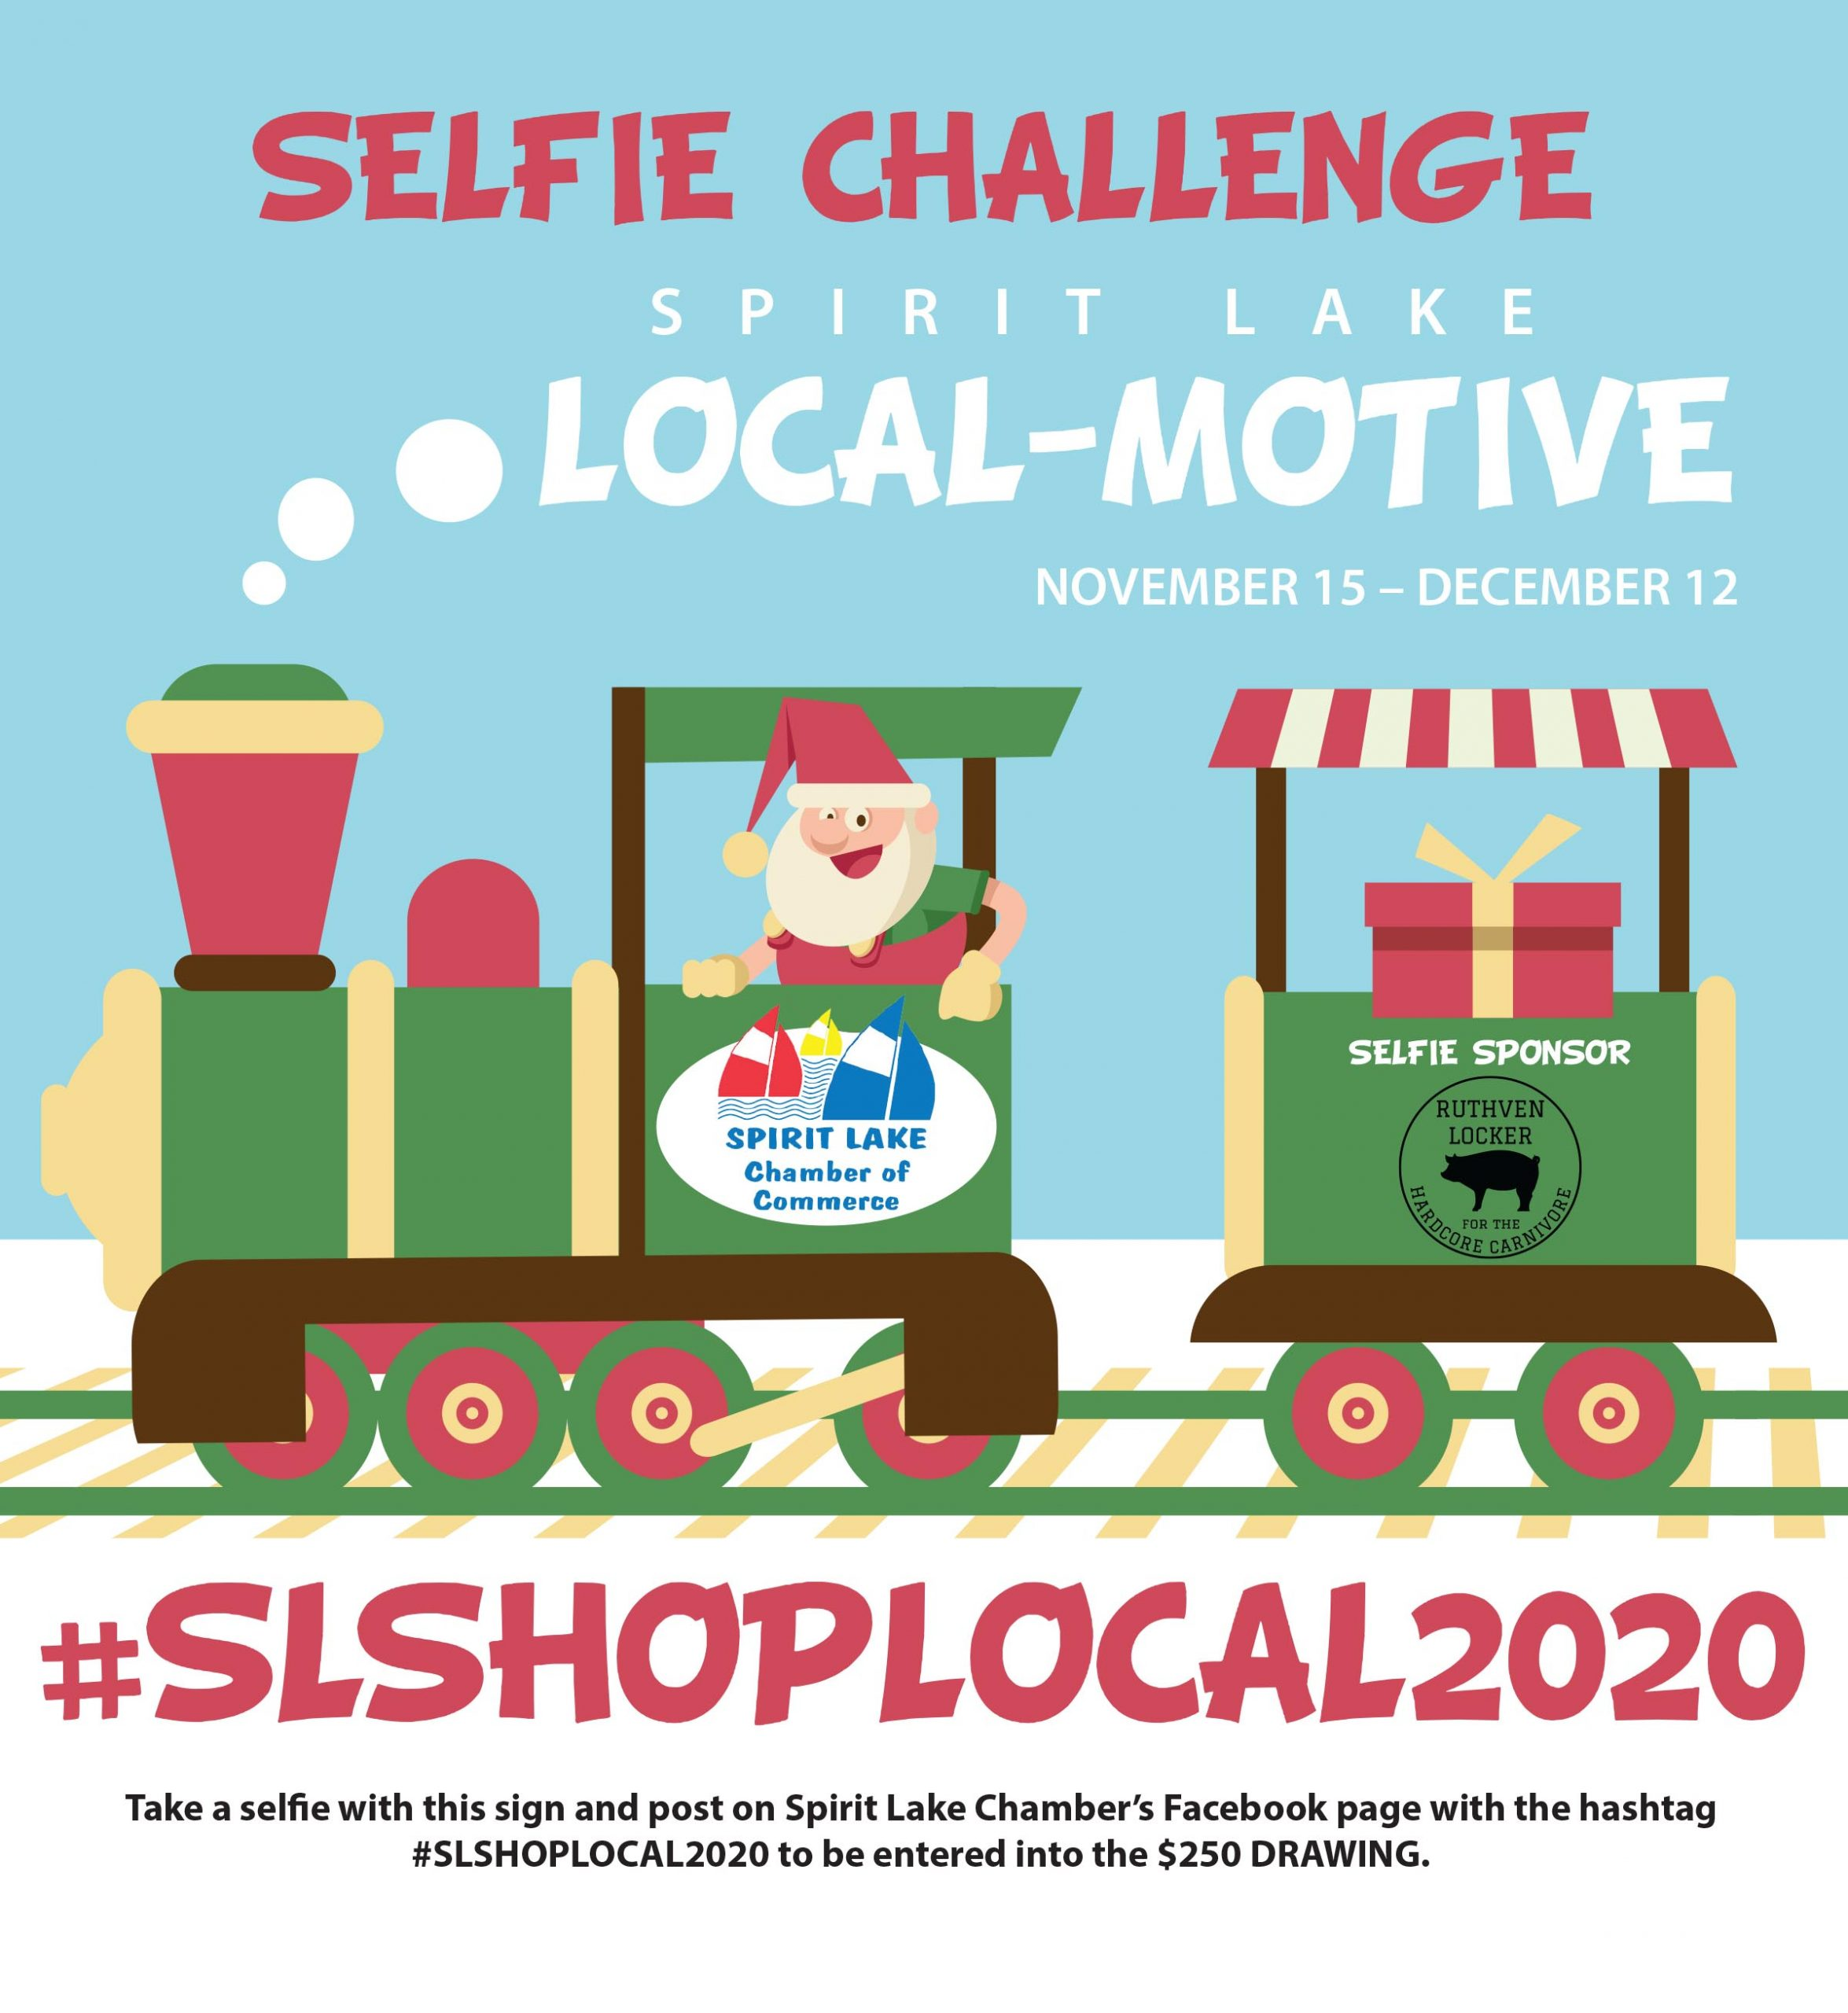 Local-Motive-SelfieStick-ONLYSELFIE